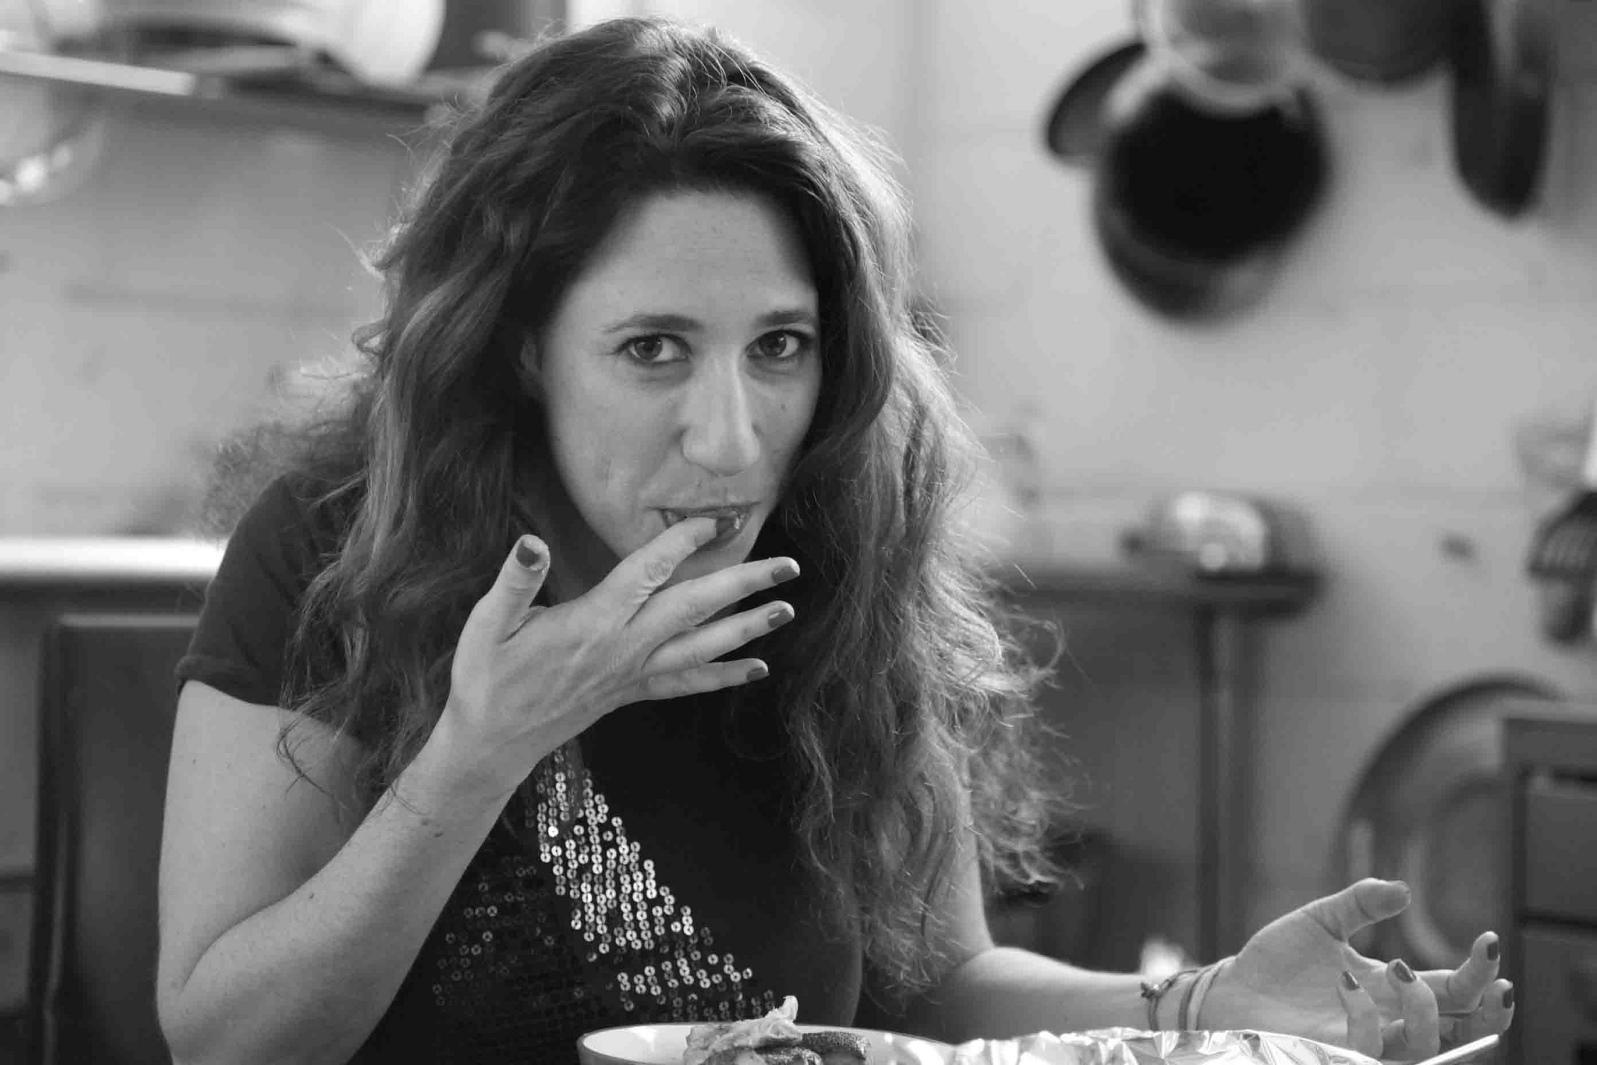 Vegan chef and consultant Ori Shavit. Photo by Dan Lev